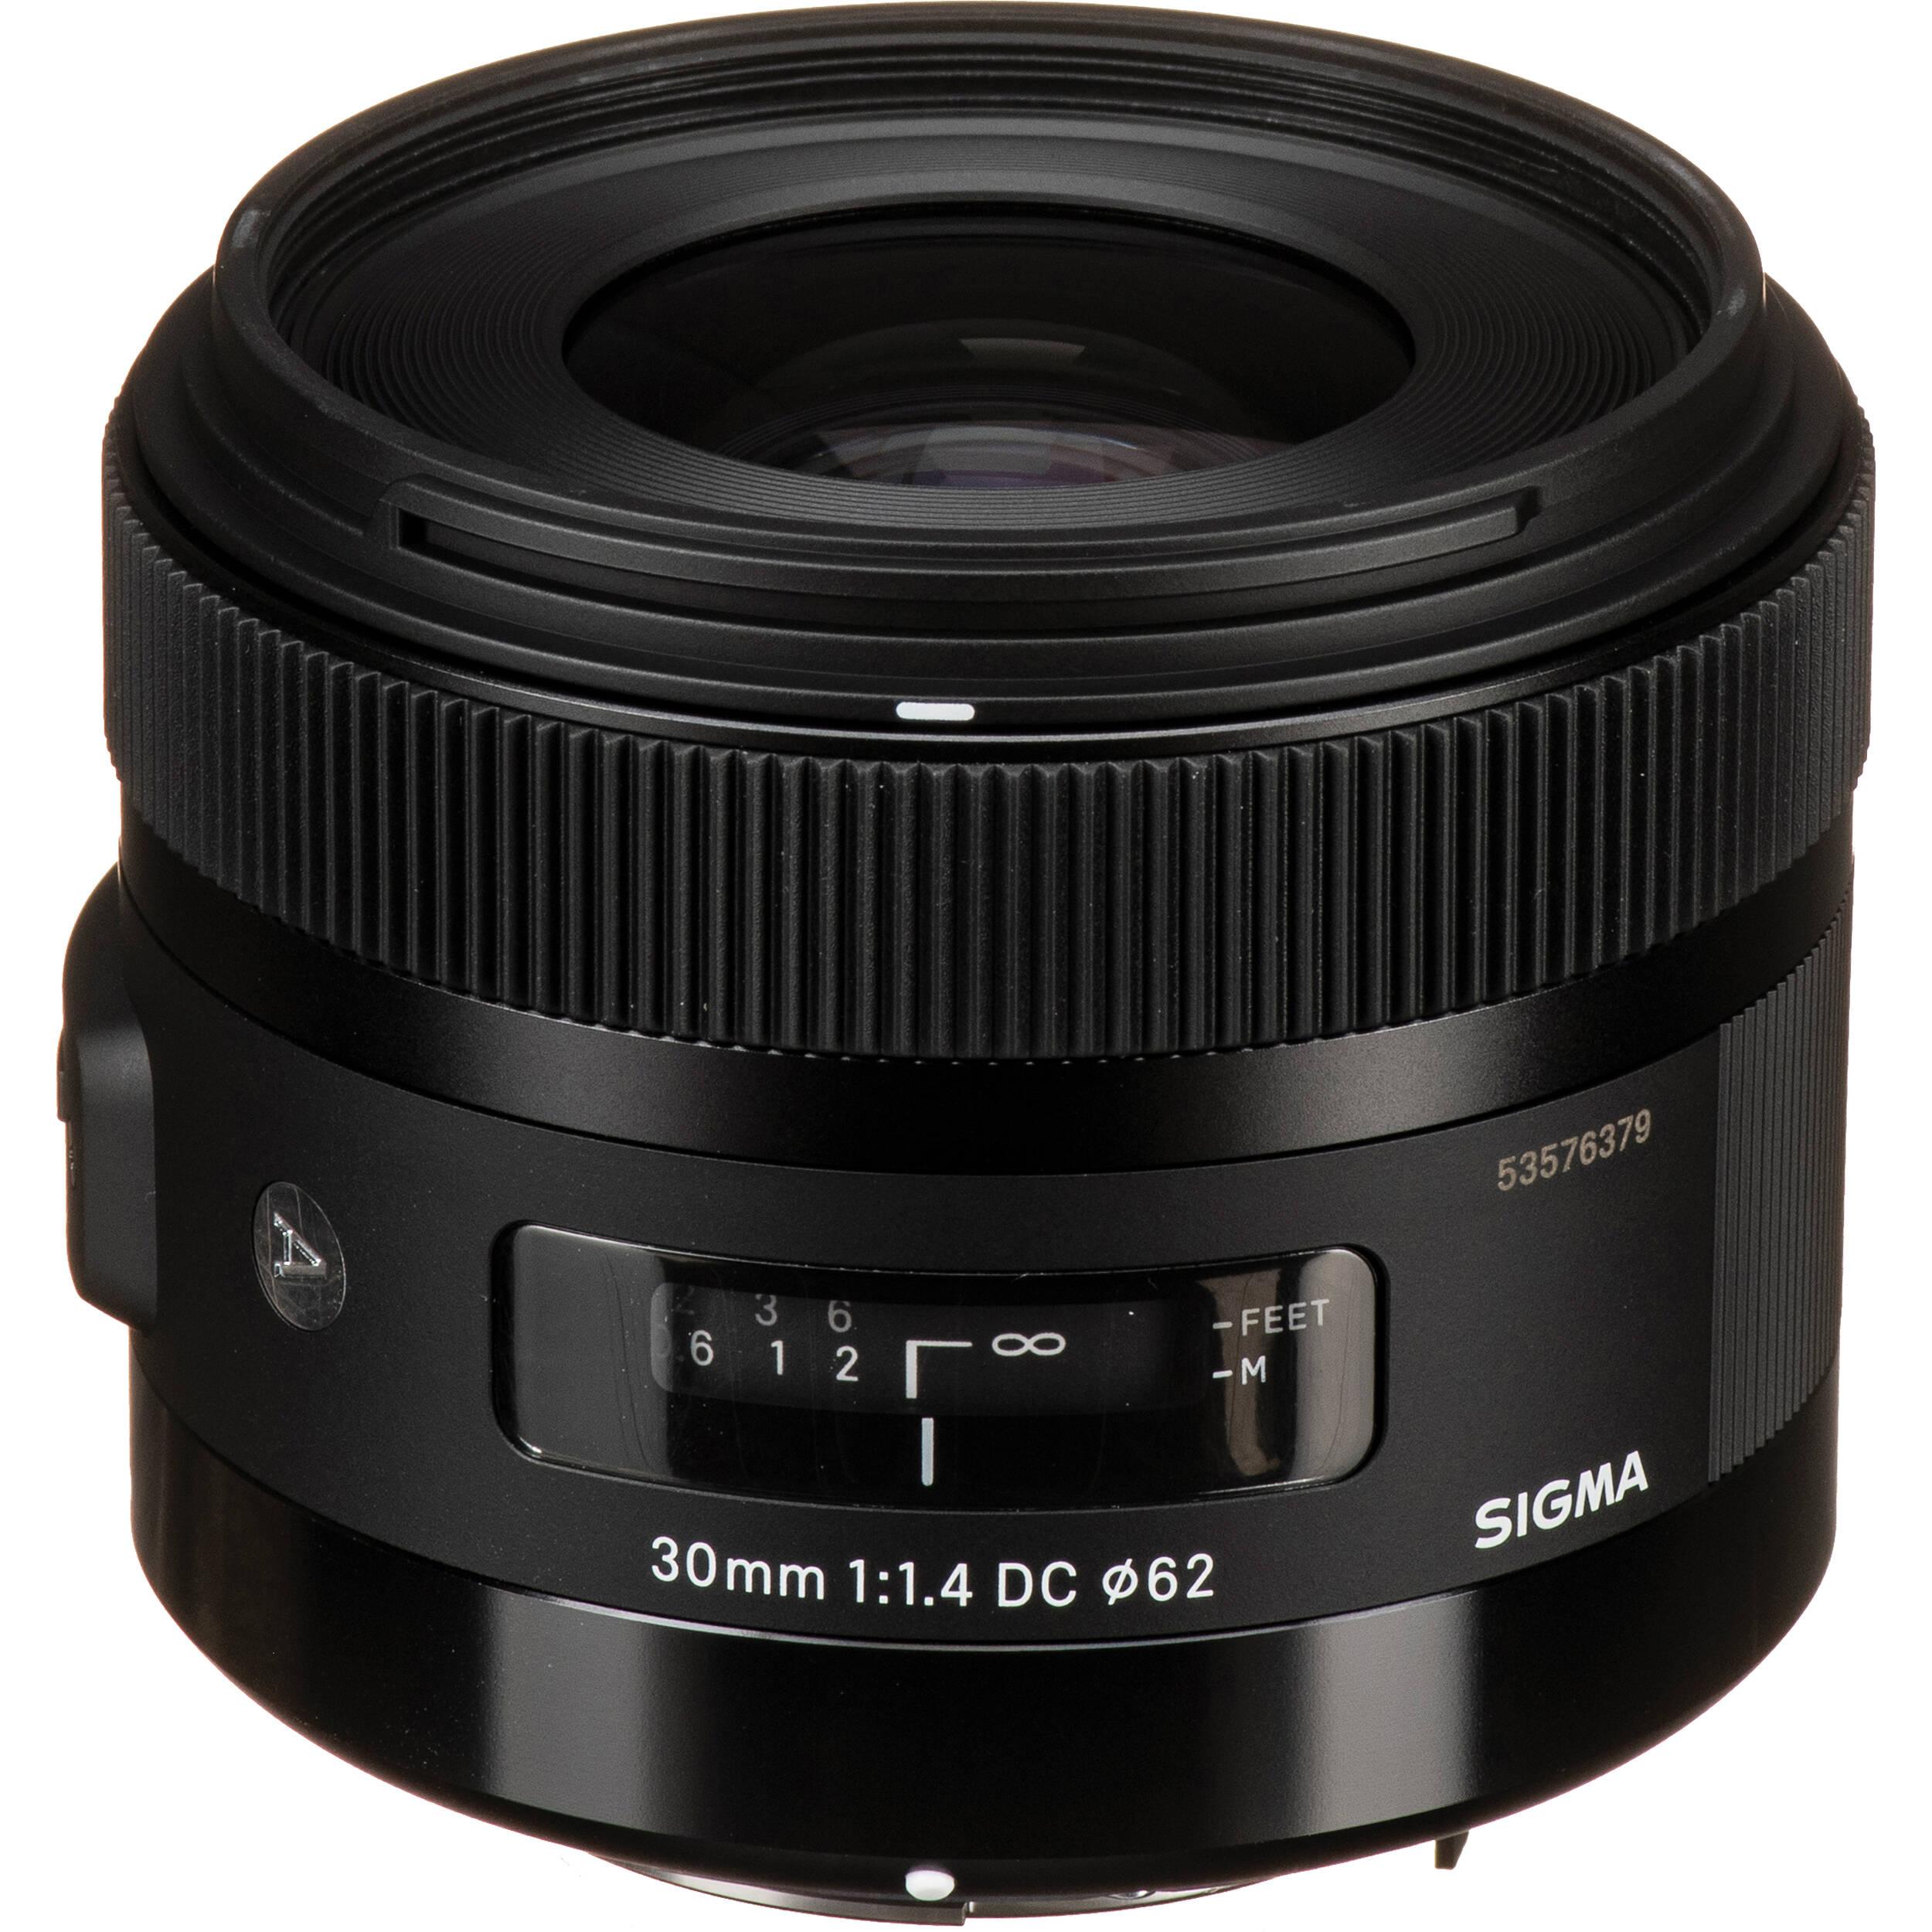 Sigma 30mm F 1 4 Dc Hsm Art Lens For Pentax 301109 B H Photo